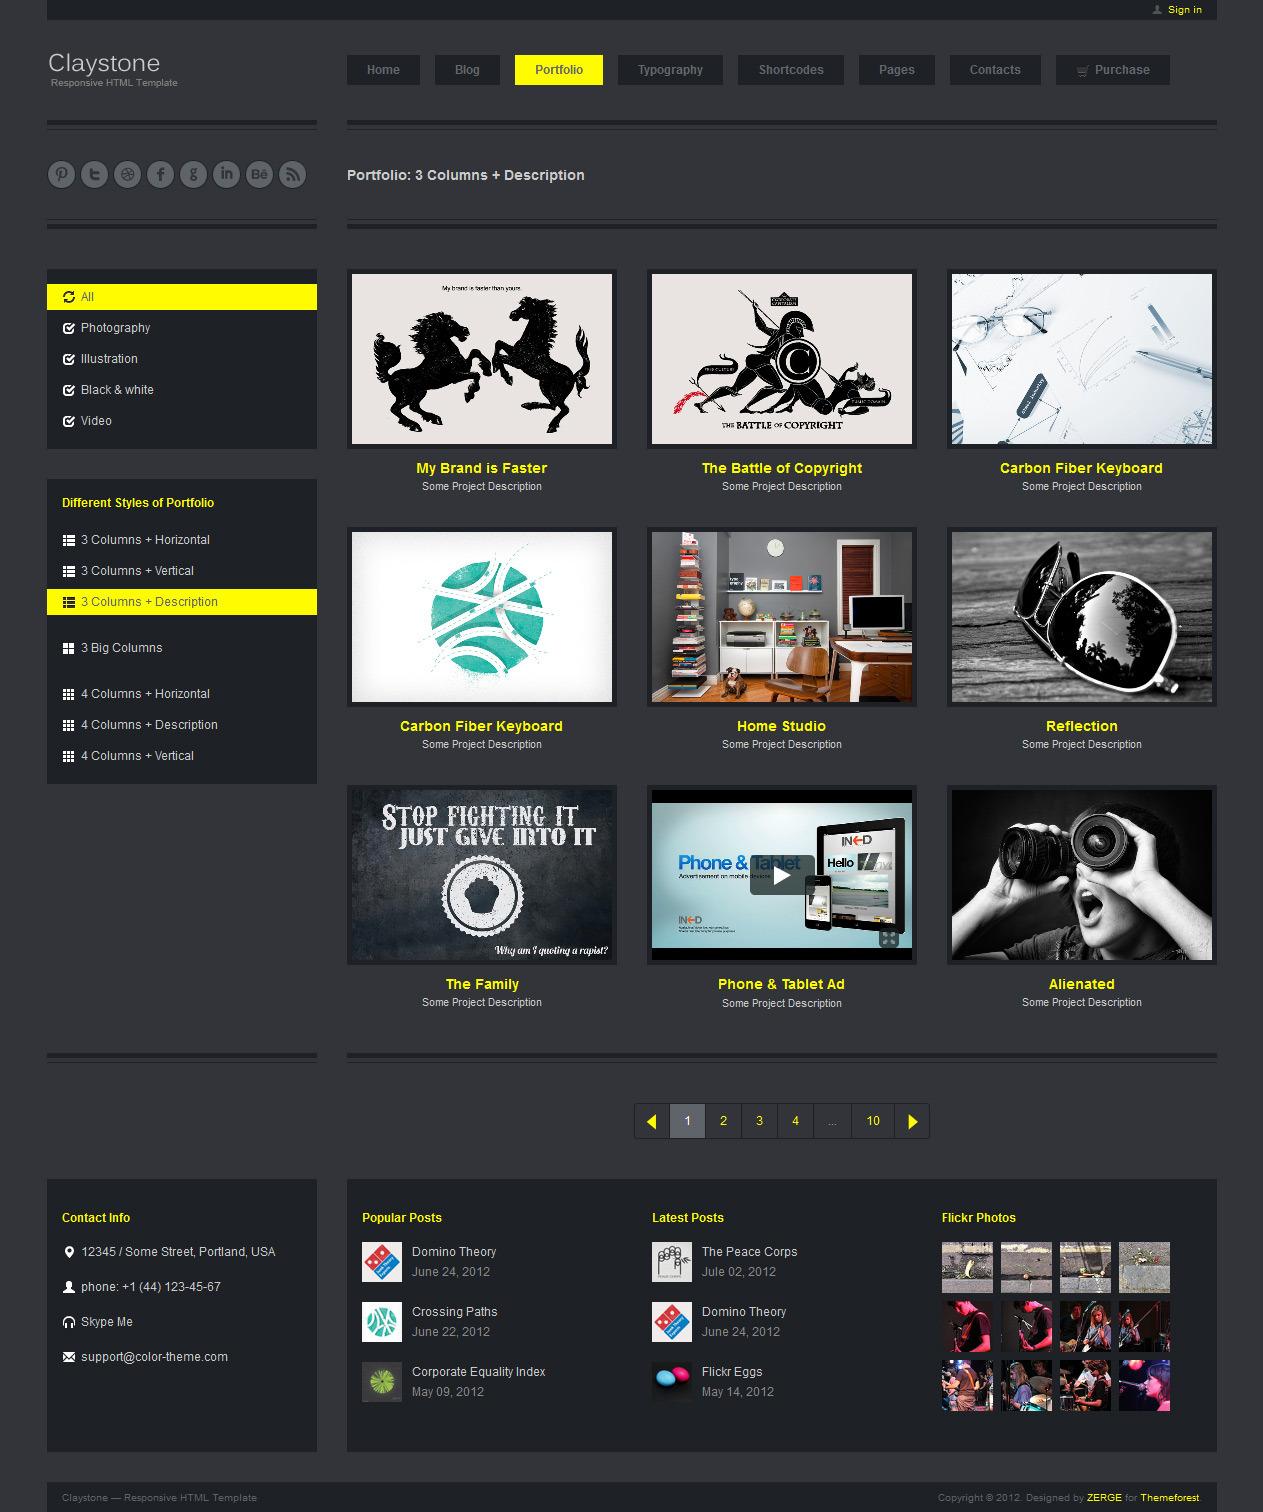 Claystone - Responsive HTML Template - 08 Portfolio 3Col Hor Description